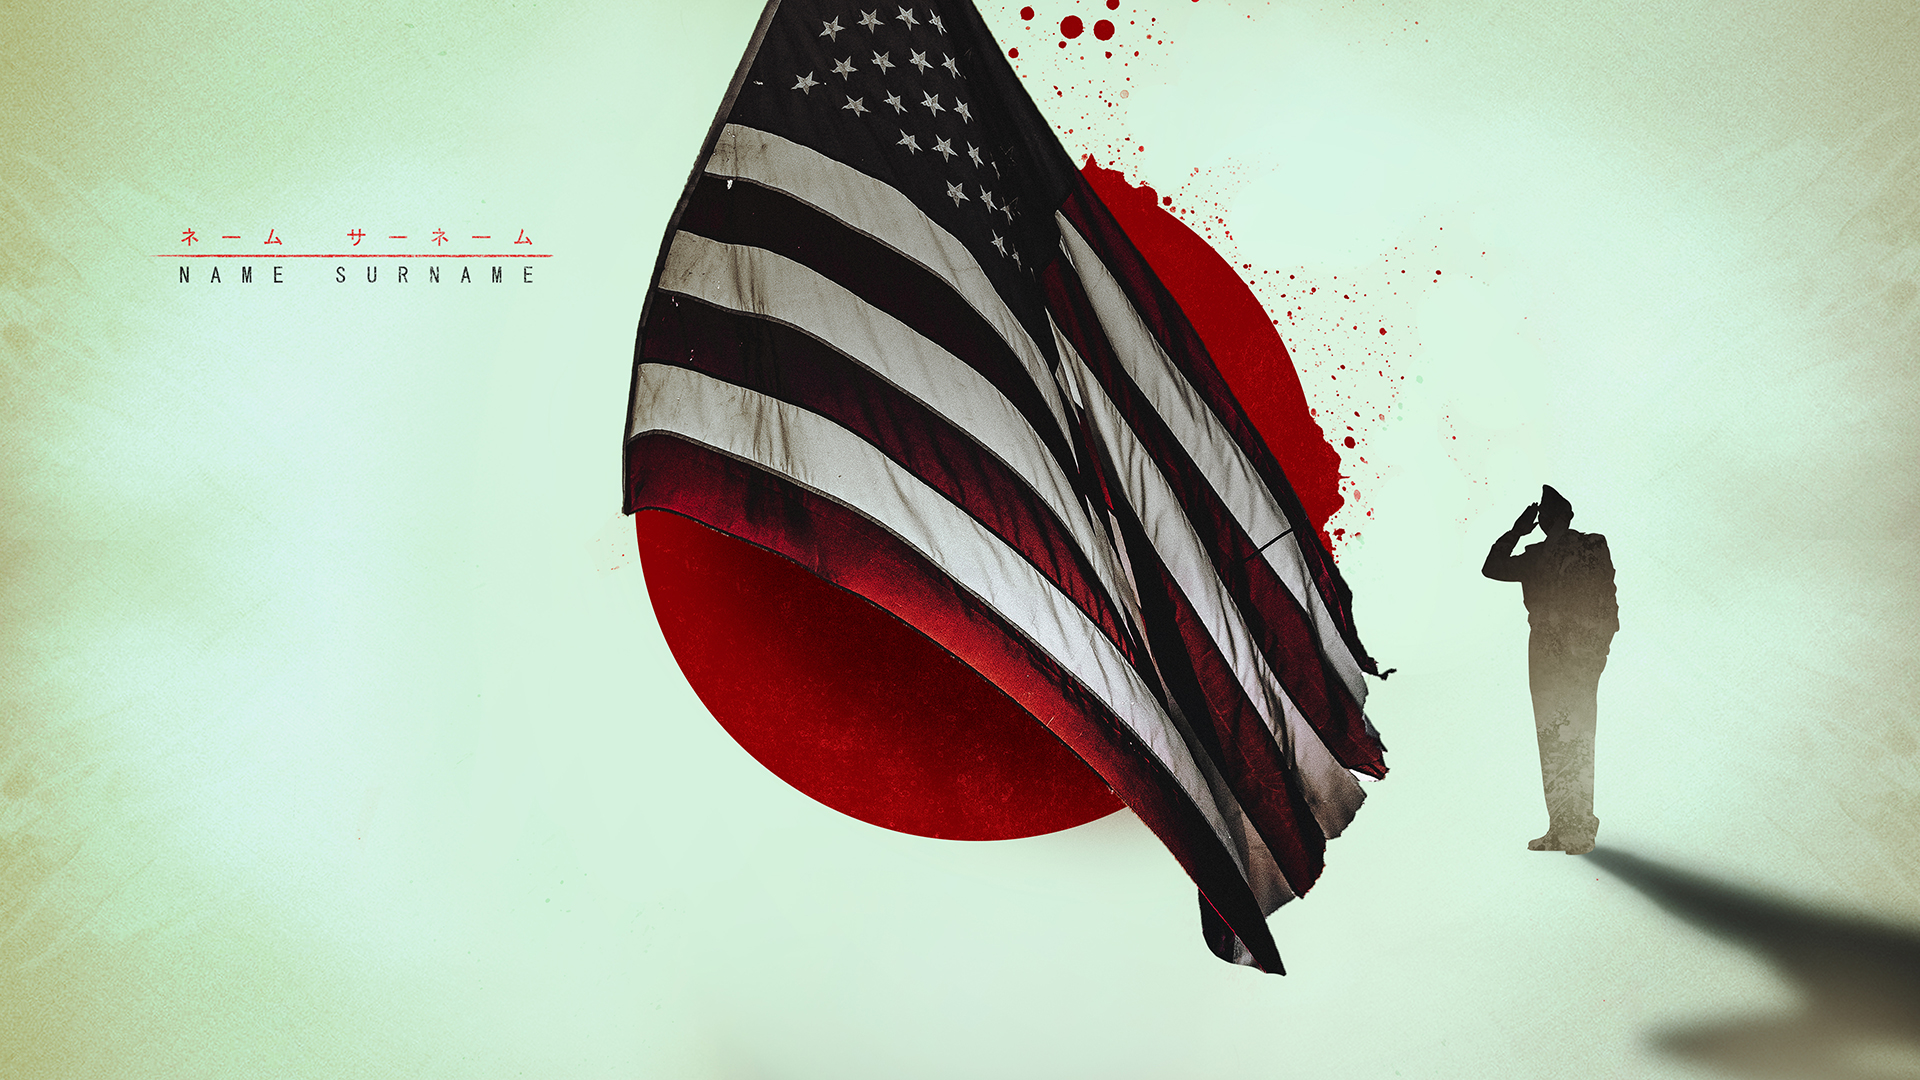 TERROR_S2_Concept01_02_Flag_Duality